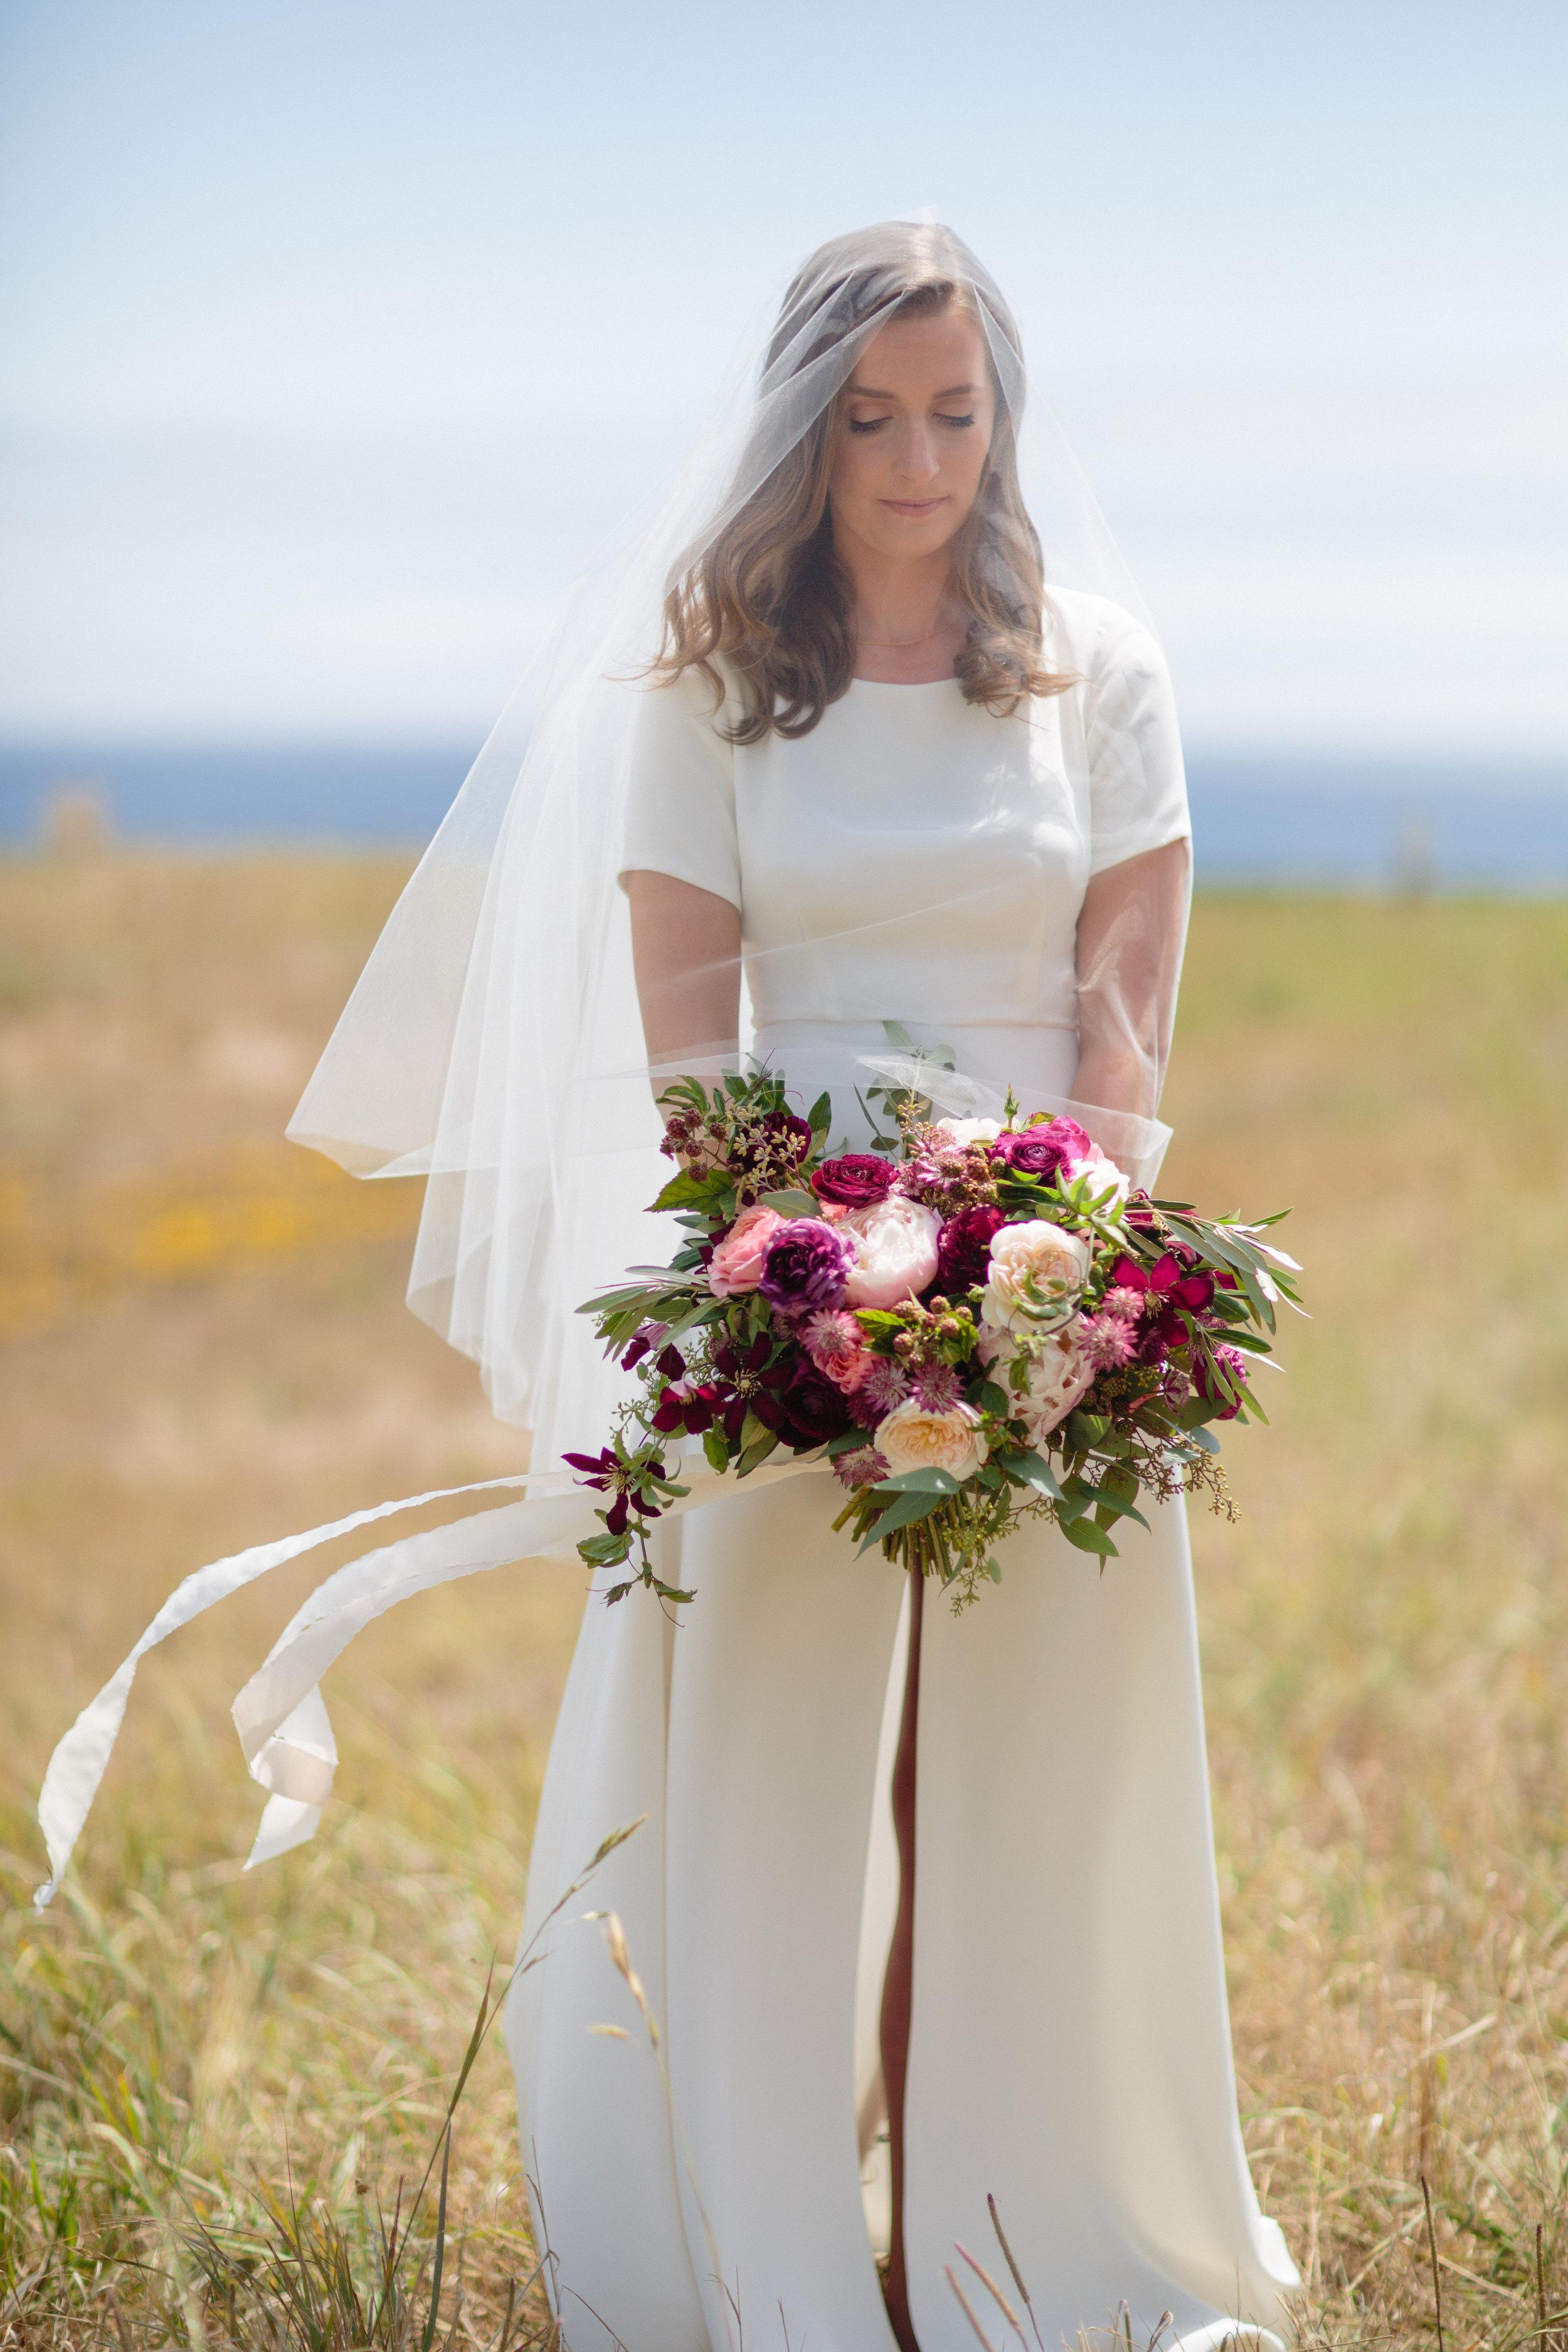 larissa-cleveland-sivanjeremy-wedding-0220.jpg